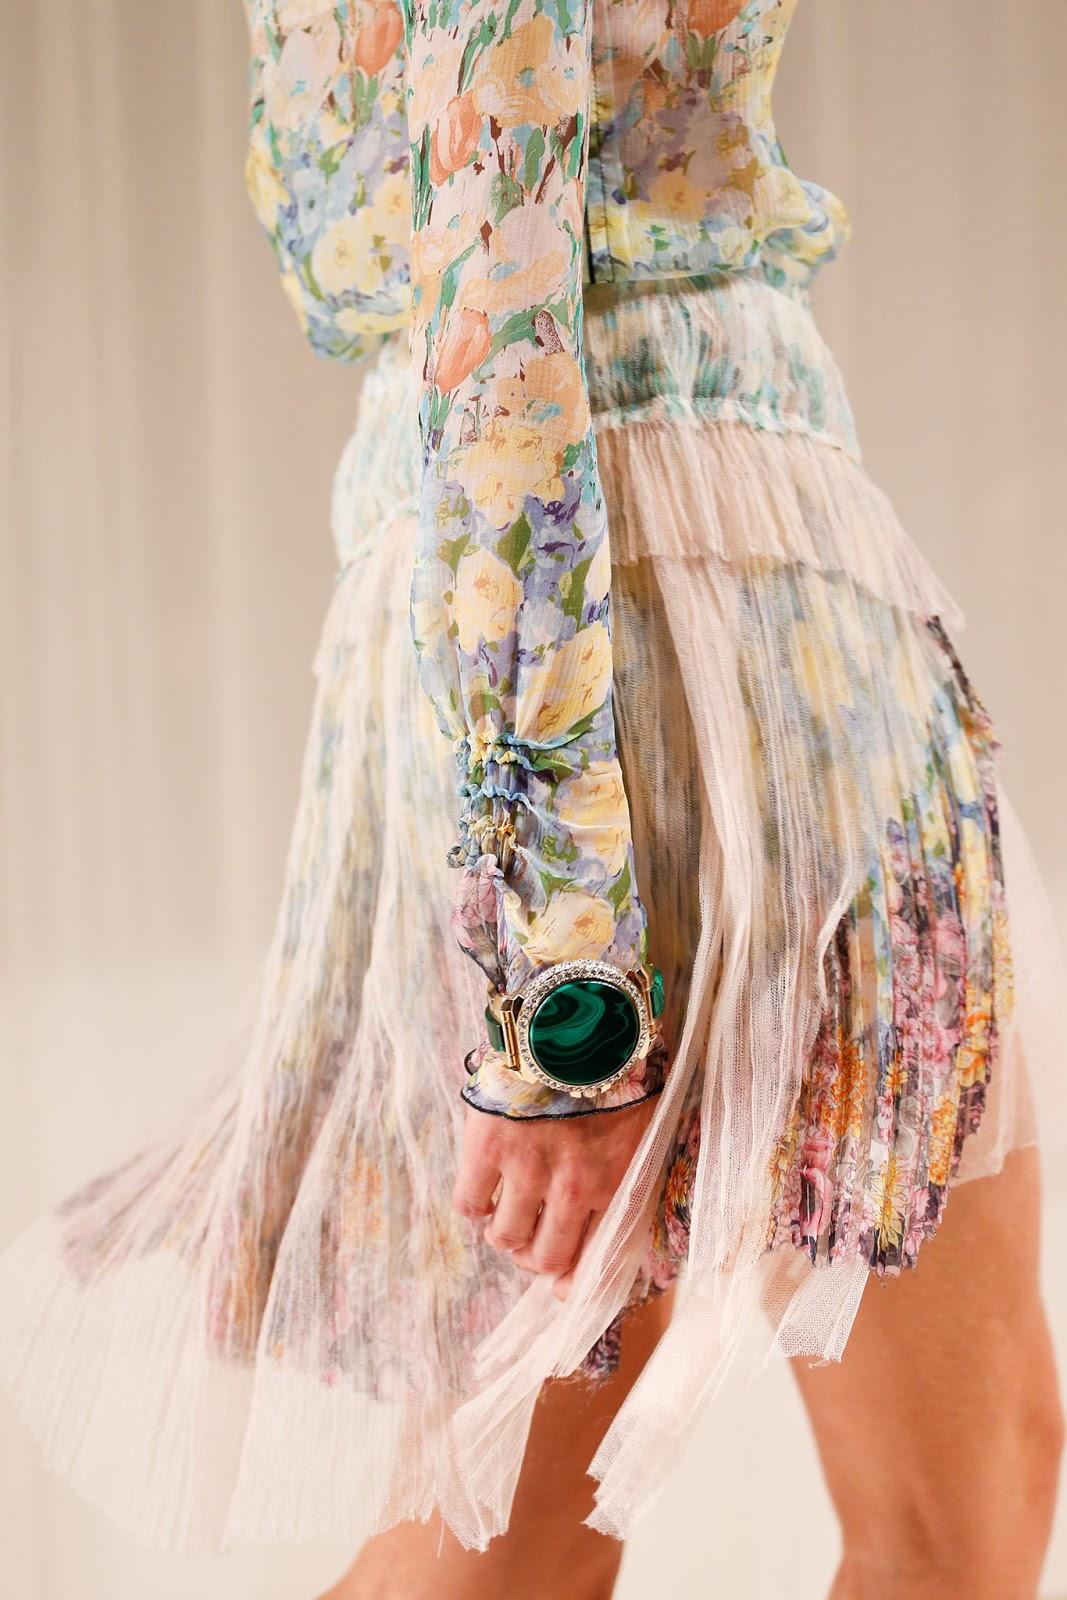 Nina Ricci Spring/Summer 2014